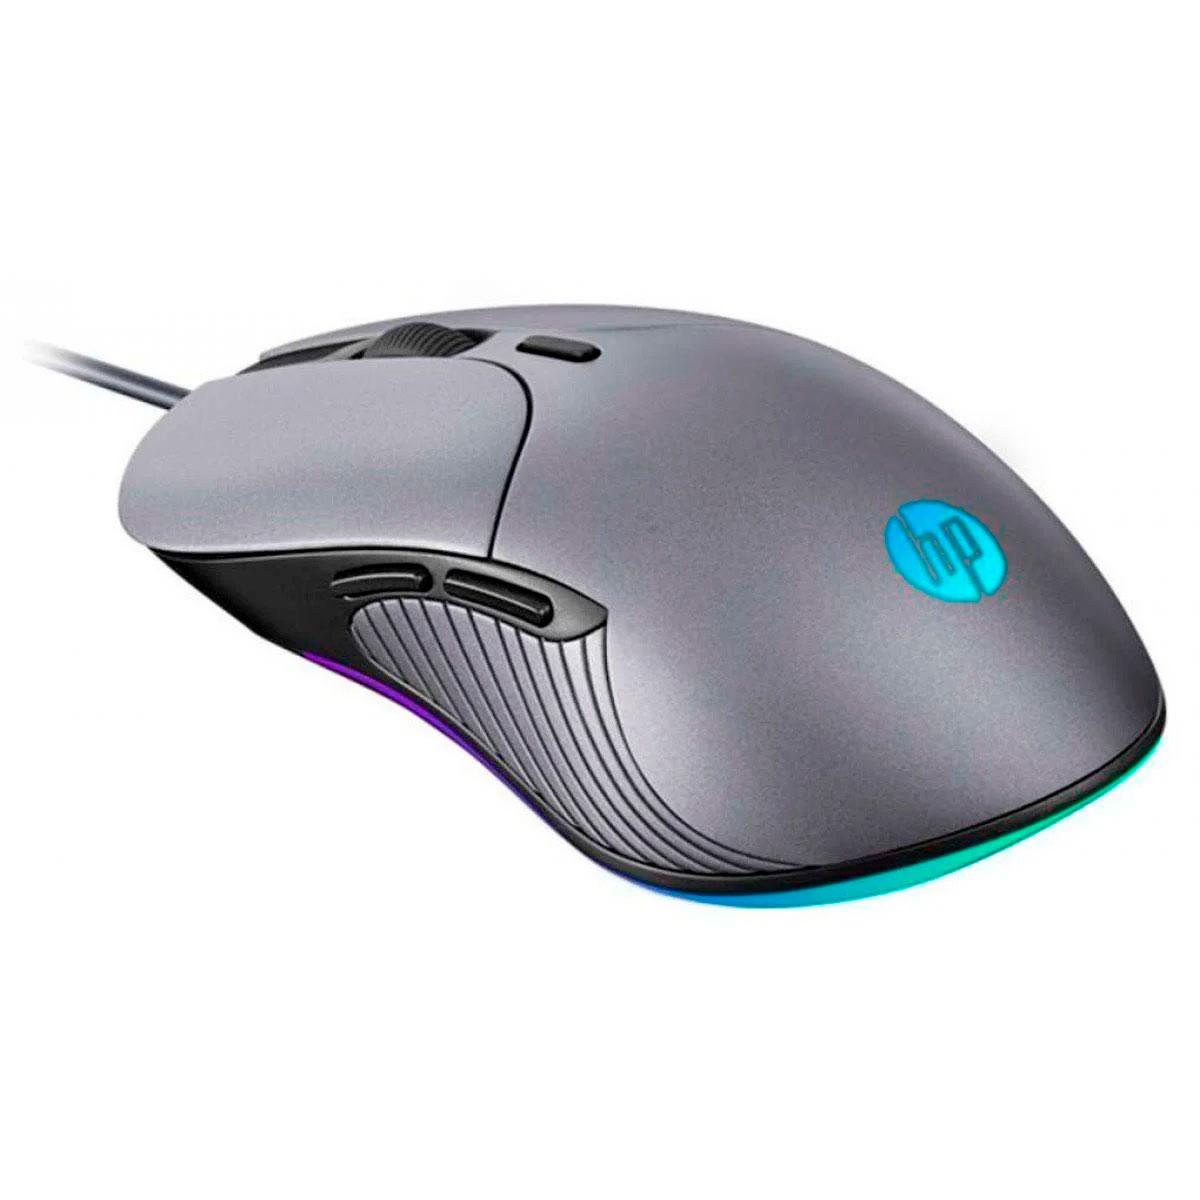 Mouse Gamer HP M280, USB, RGB, 2400DPI, Chumbo